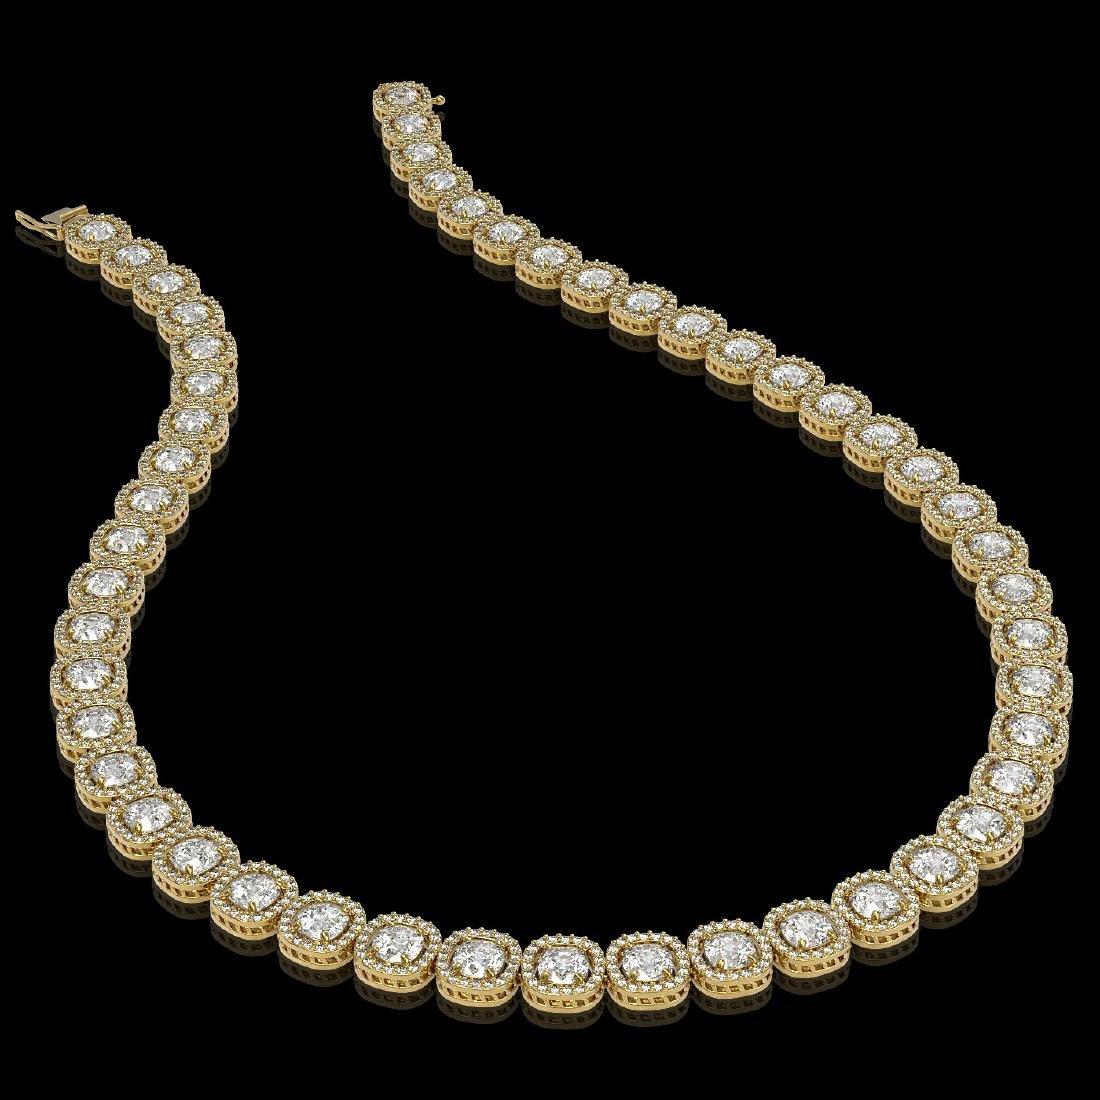 32.64 CTW Cushion Diamond Designer Necklace 18K Yellow - 2